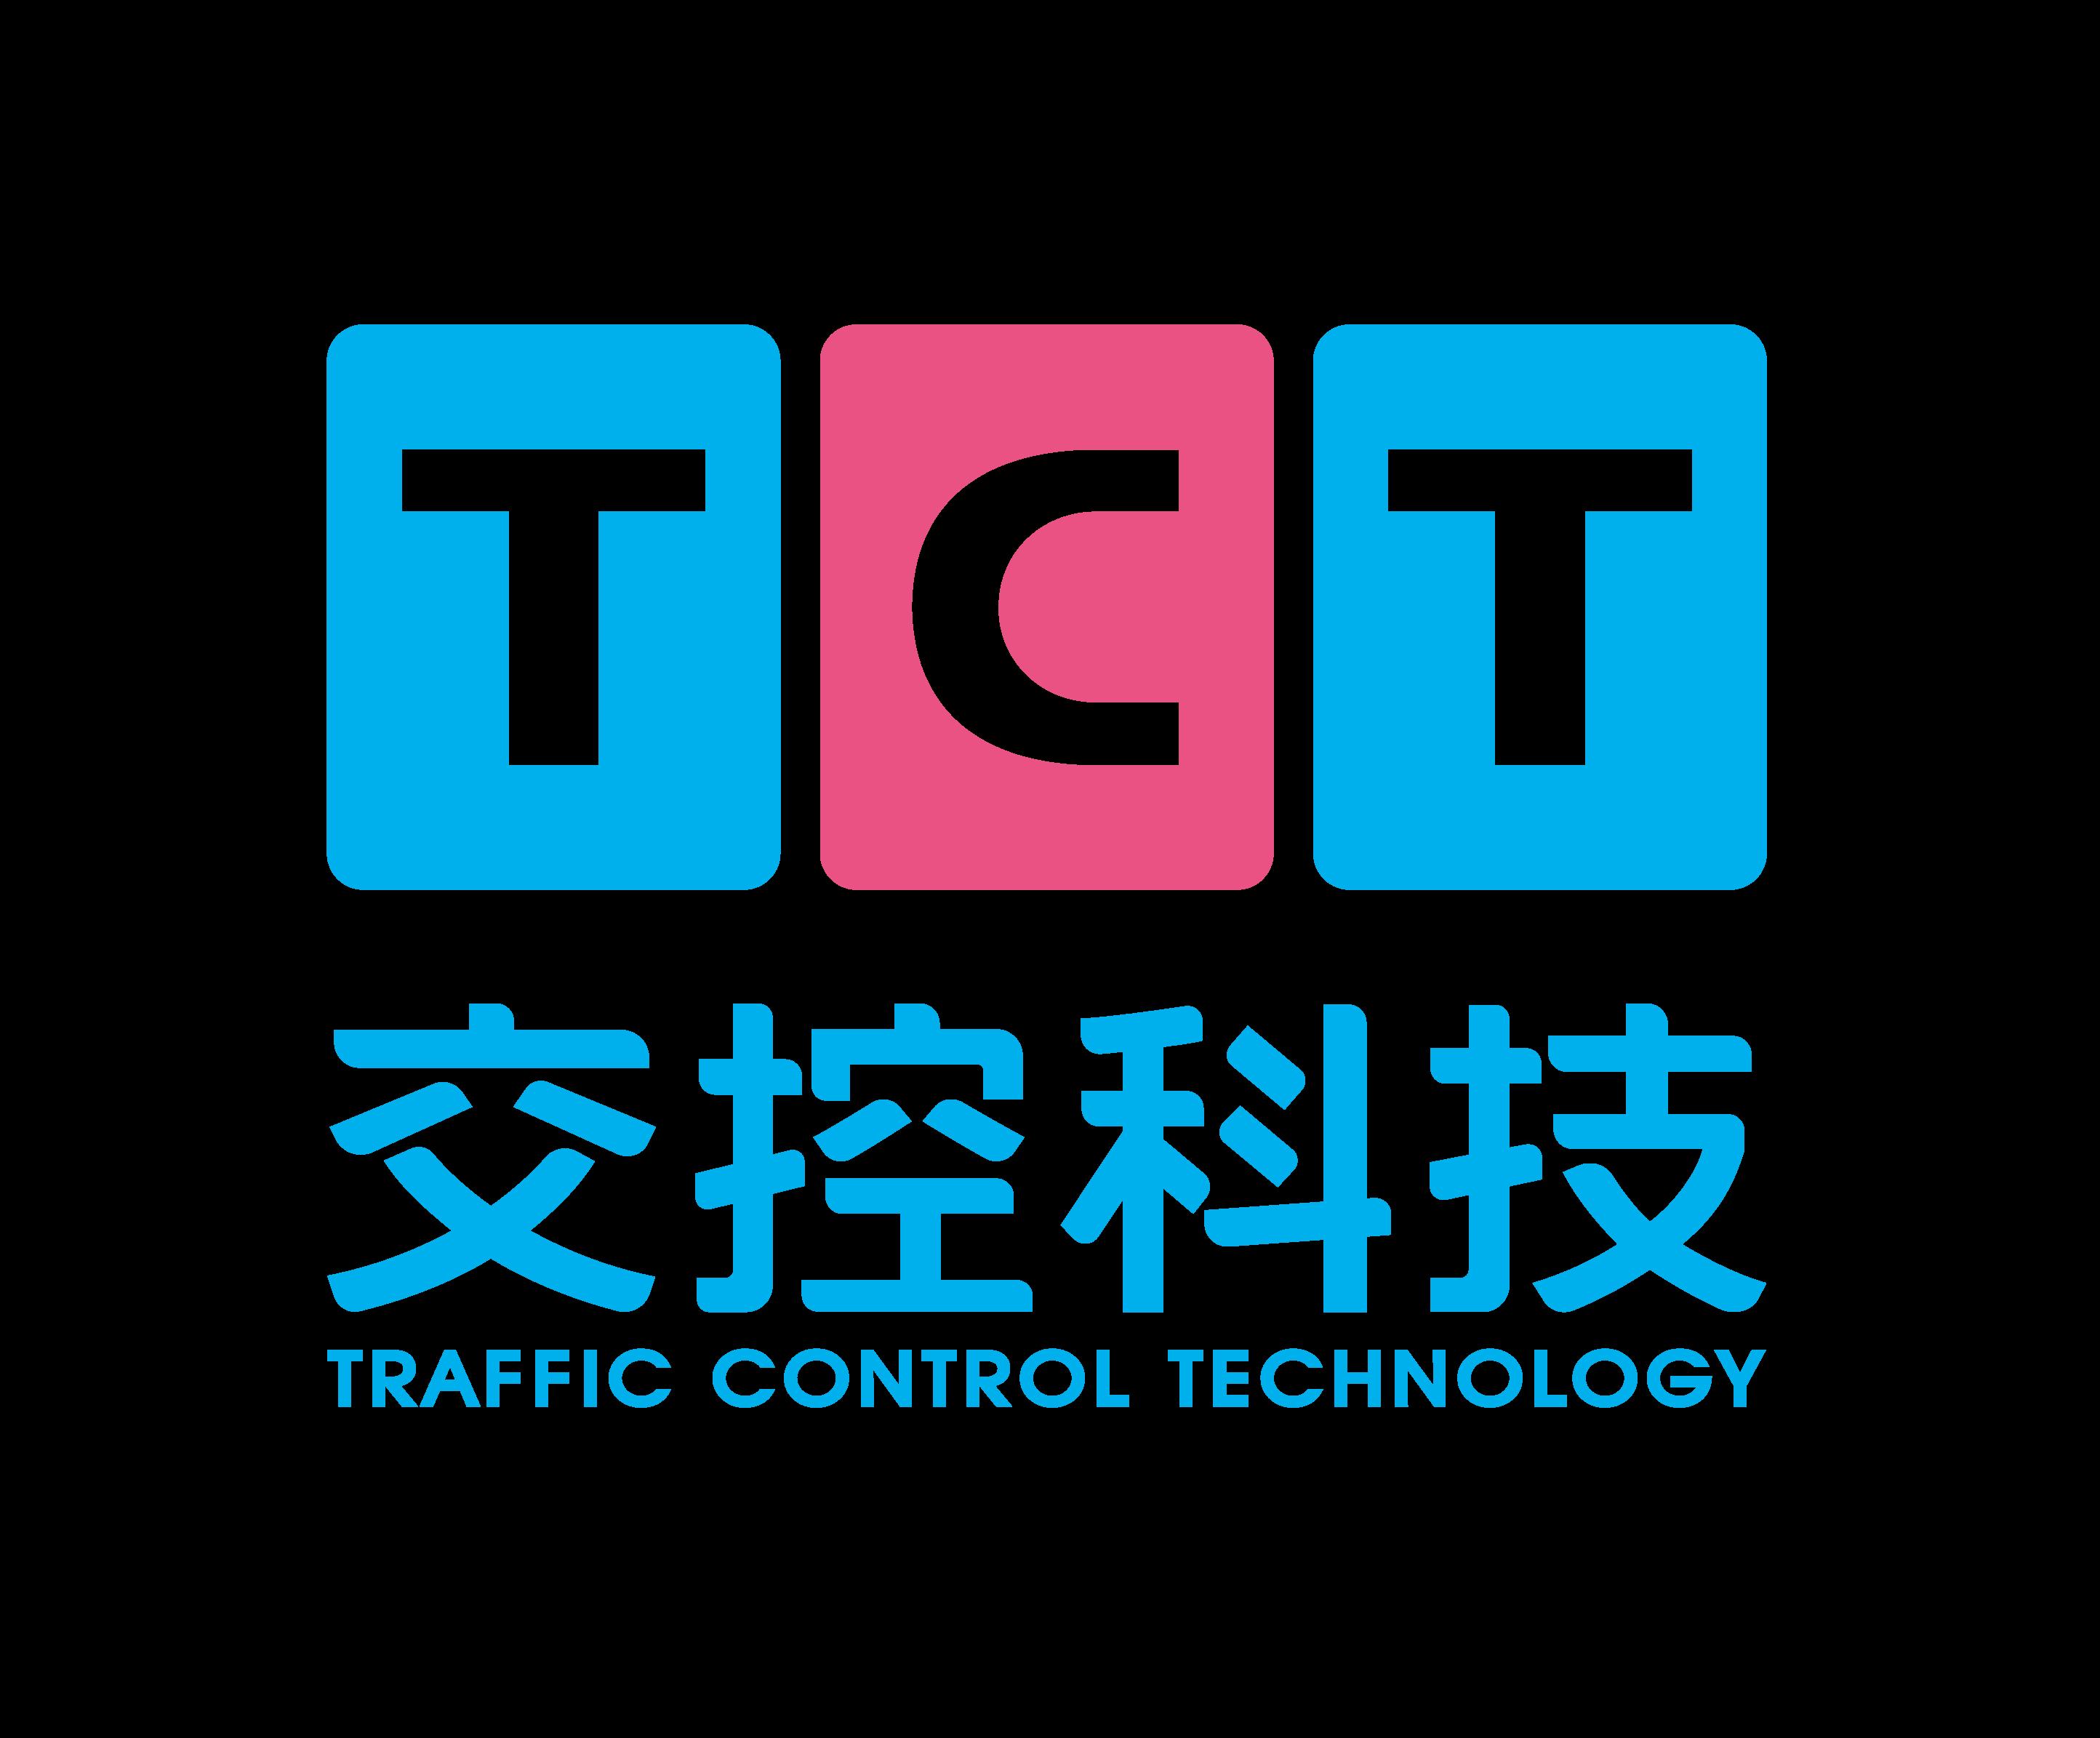 Traffic Control Technology